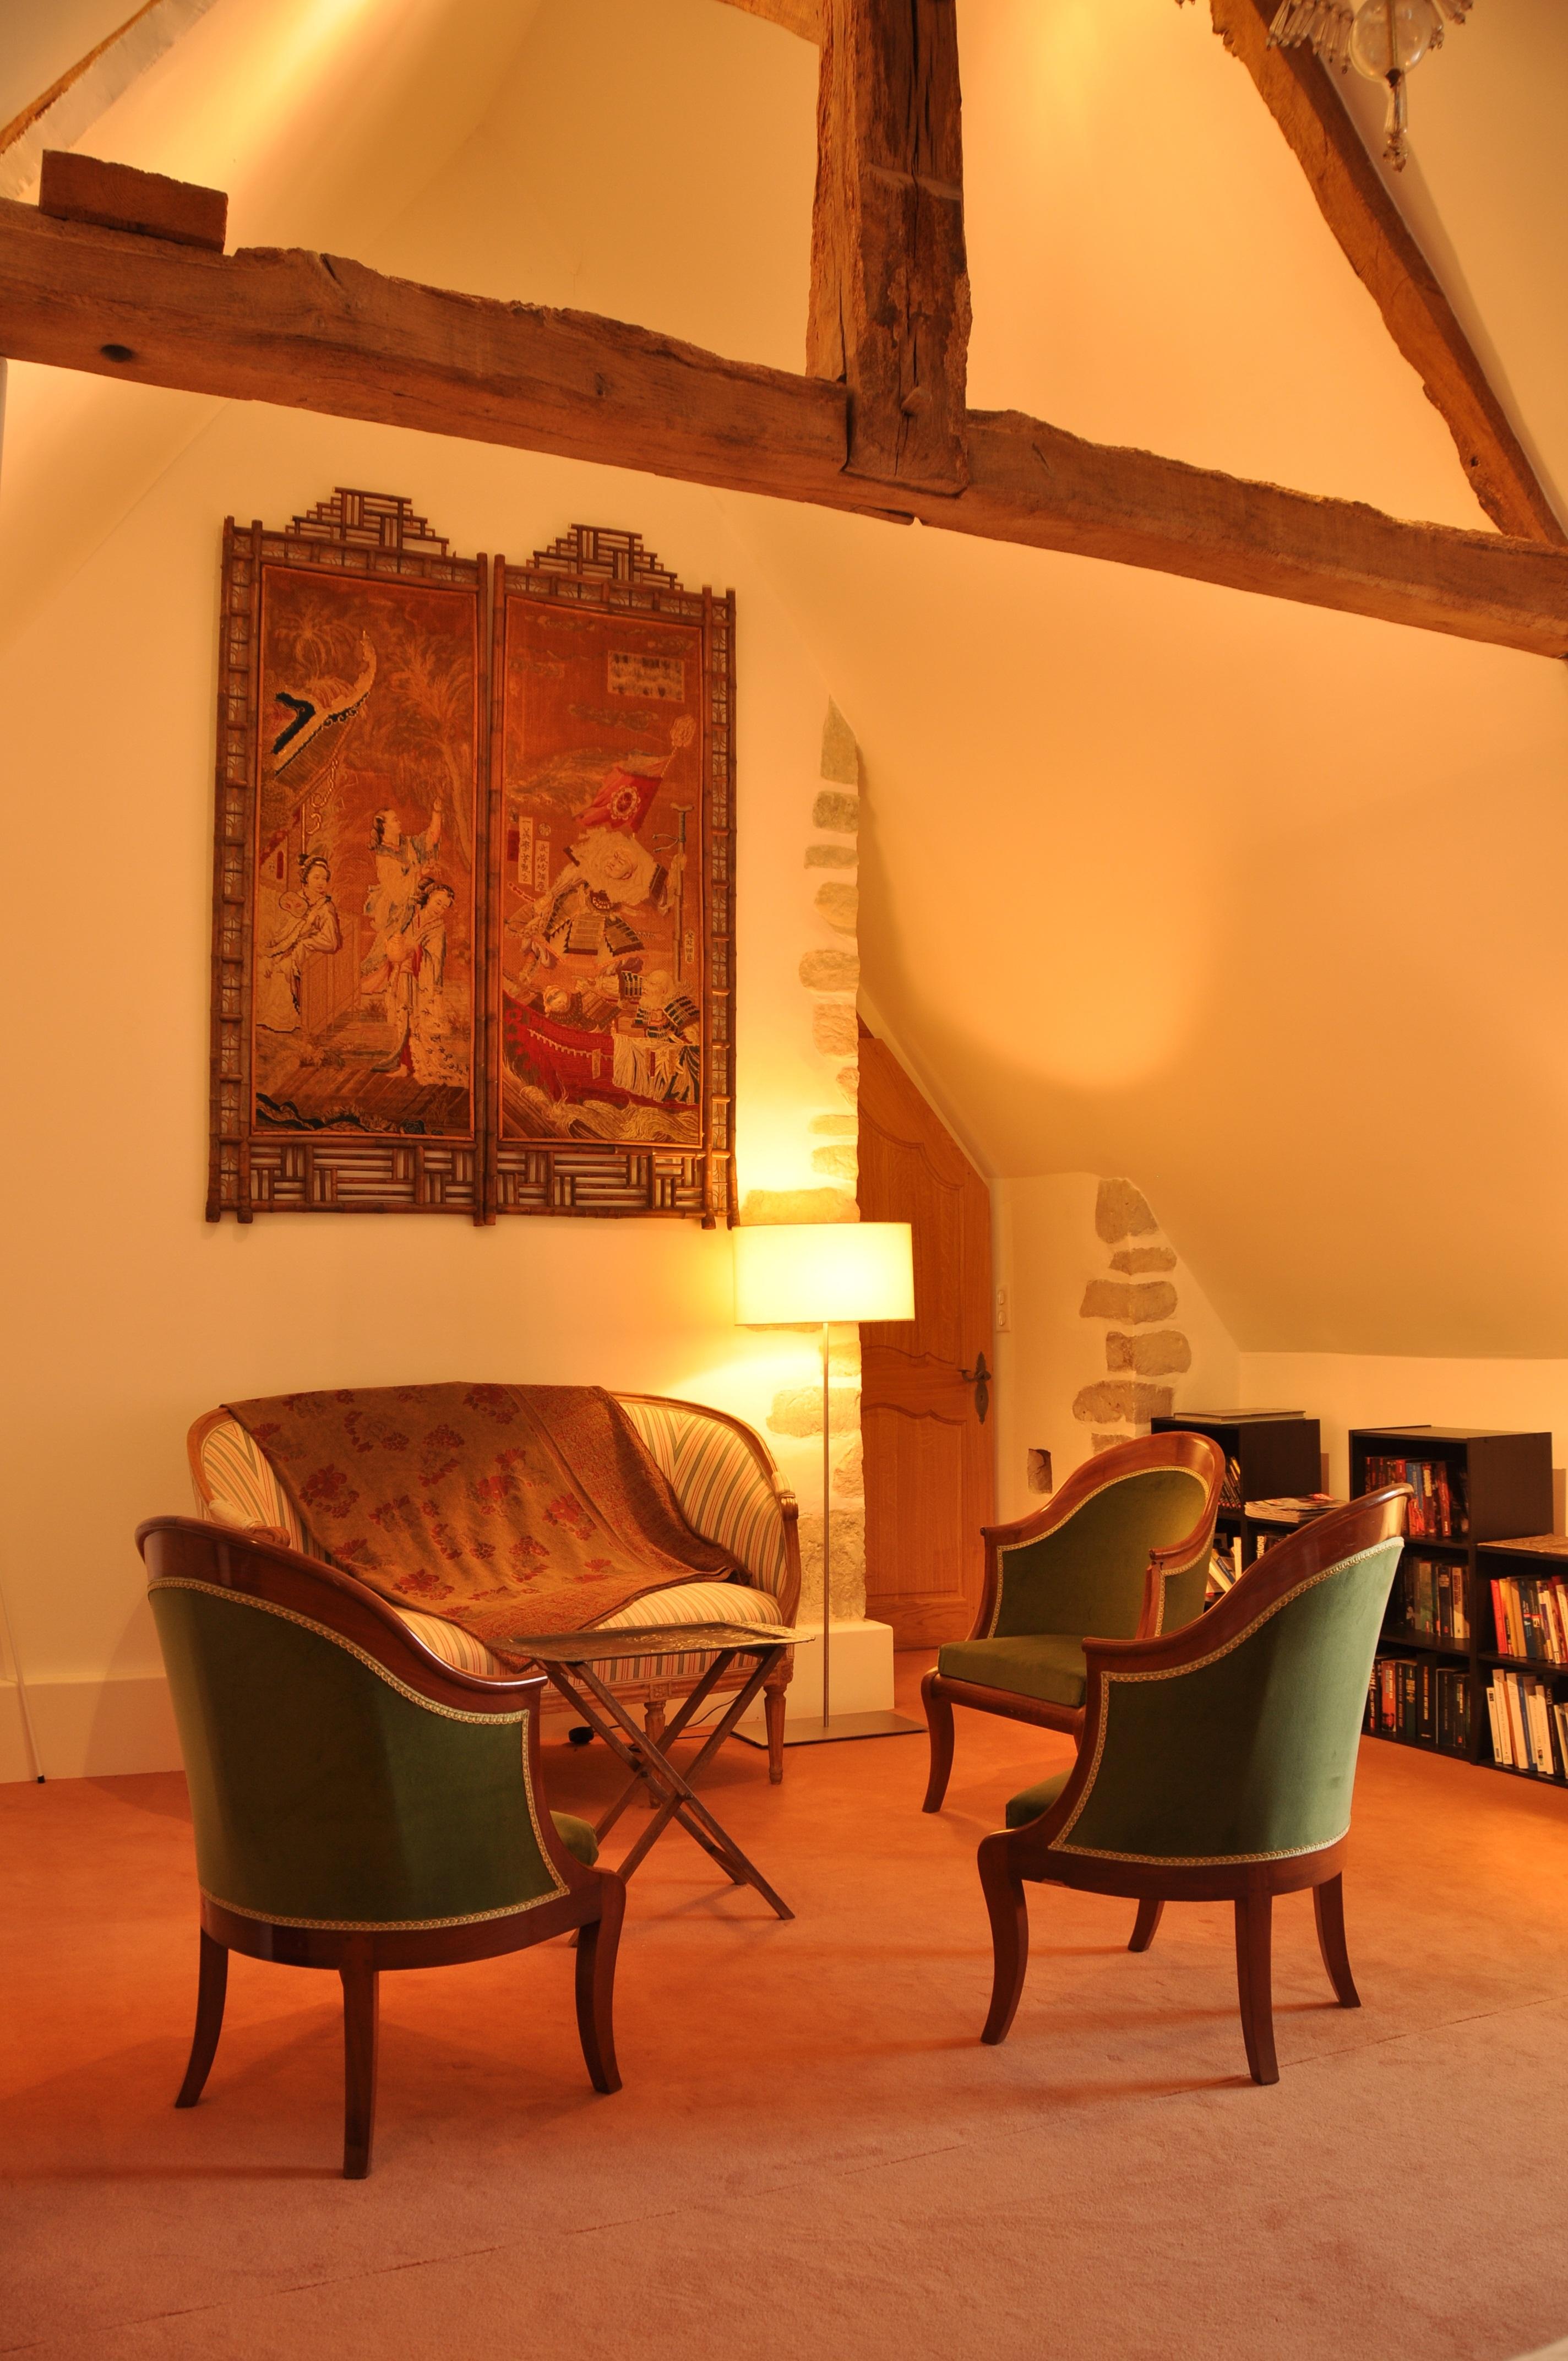 The Cardinal bedroom